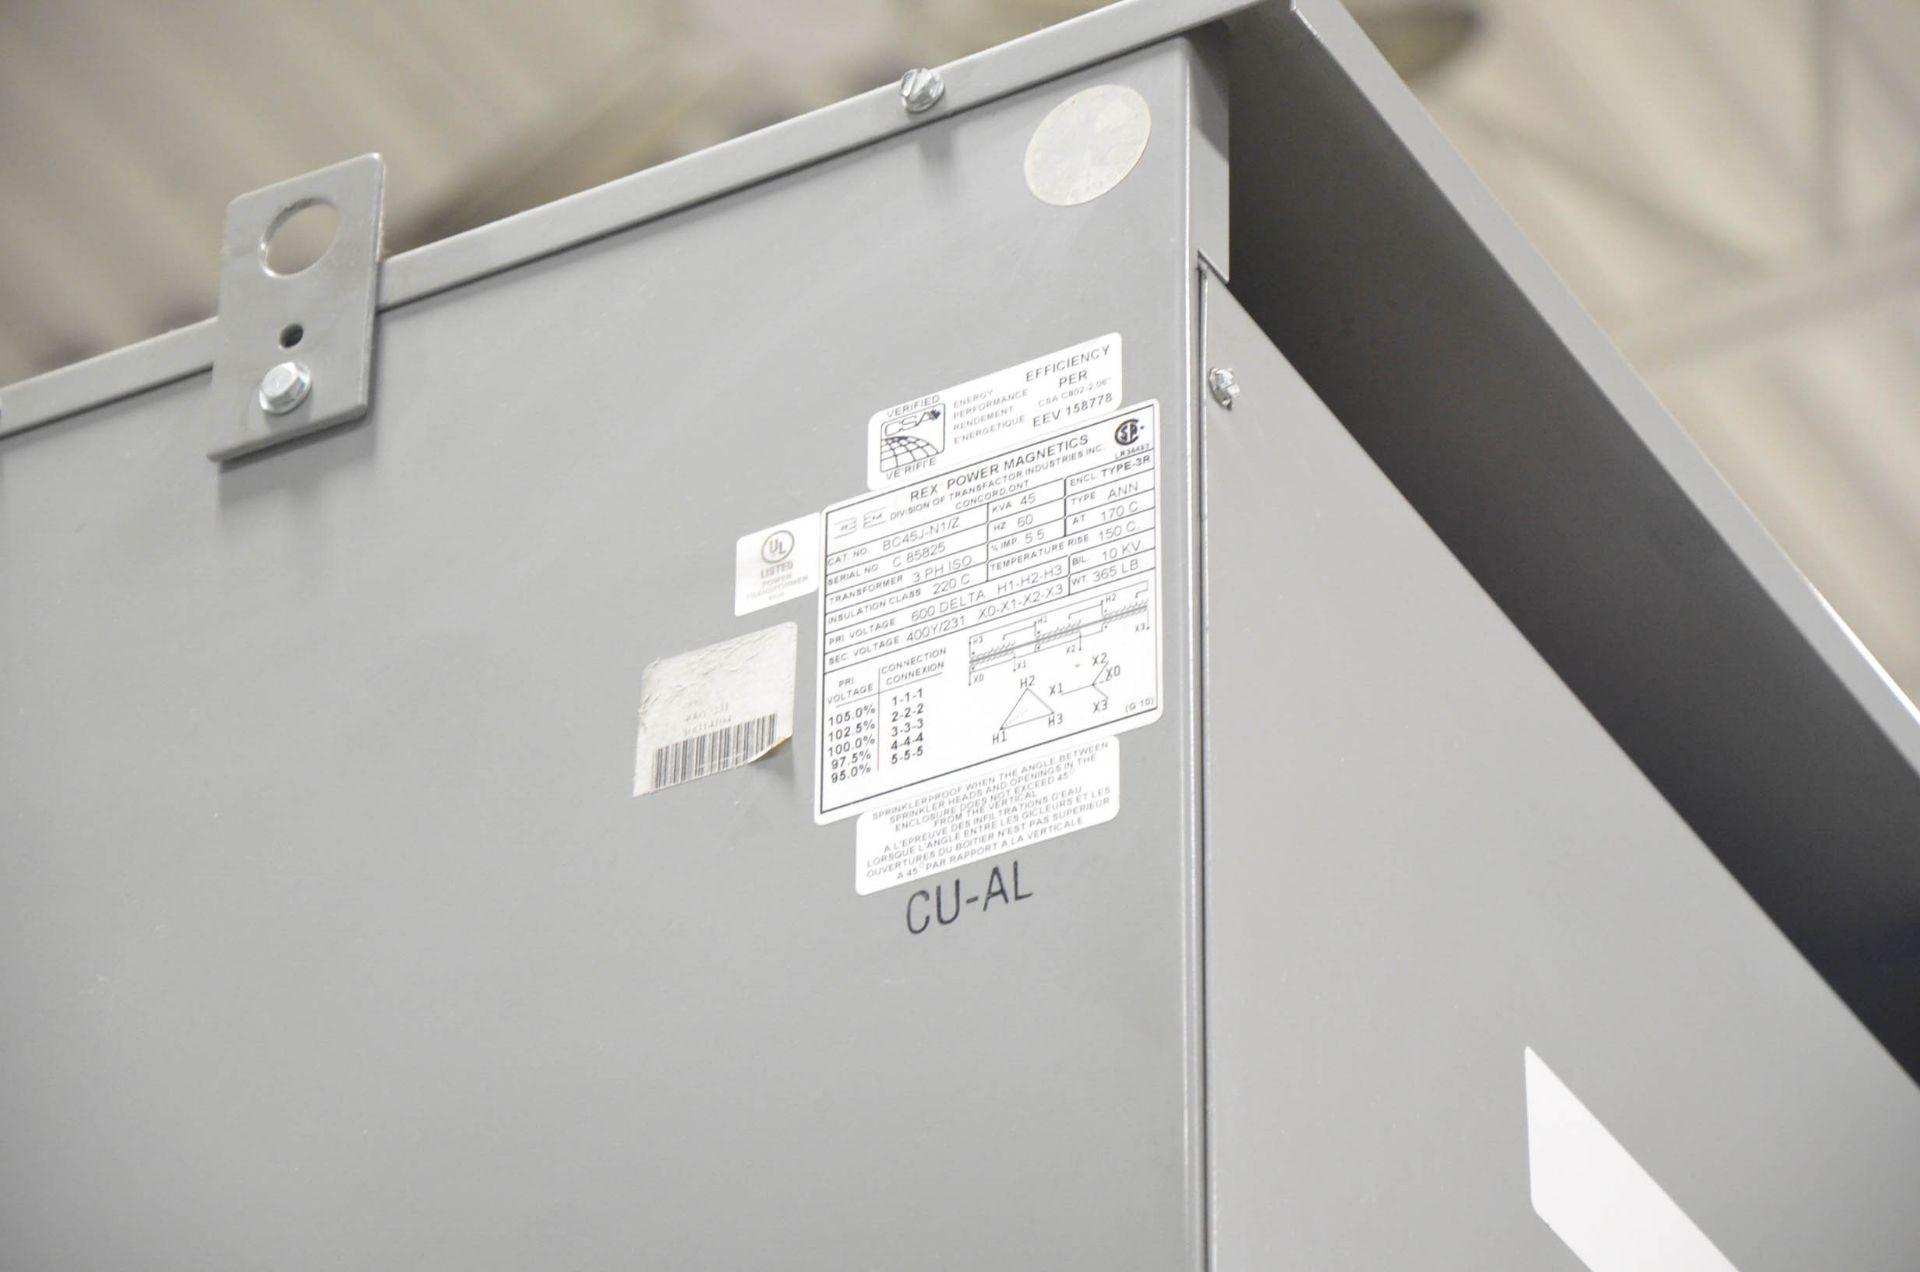 REX 45KVA/600-400-221V/3PH/60HZ TRANSFORMER (CI) [RIGGING FEES FOR LOT #343 - $50 USD PLUS - Image 2 of 2